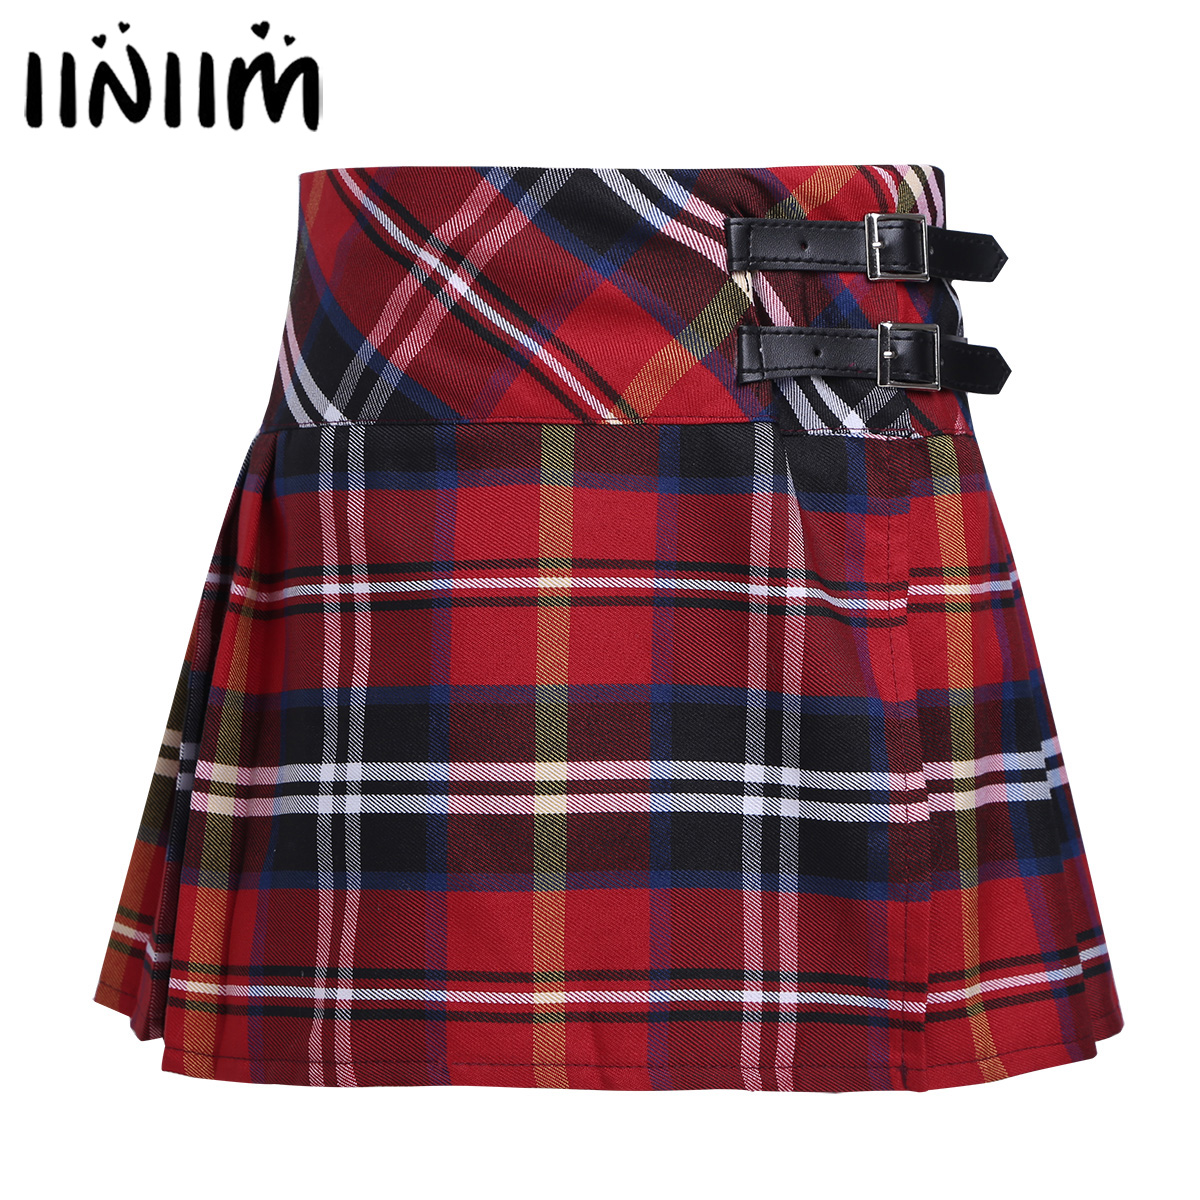 Kids Girls School Uniforms Pleated Side Split Plaid Skirt Tartan Kilt with Faux Leather Buckle Student Costumes Skirts